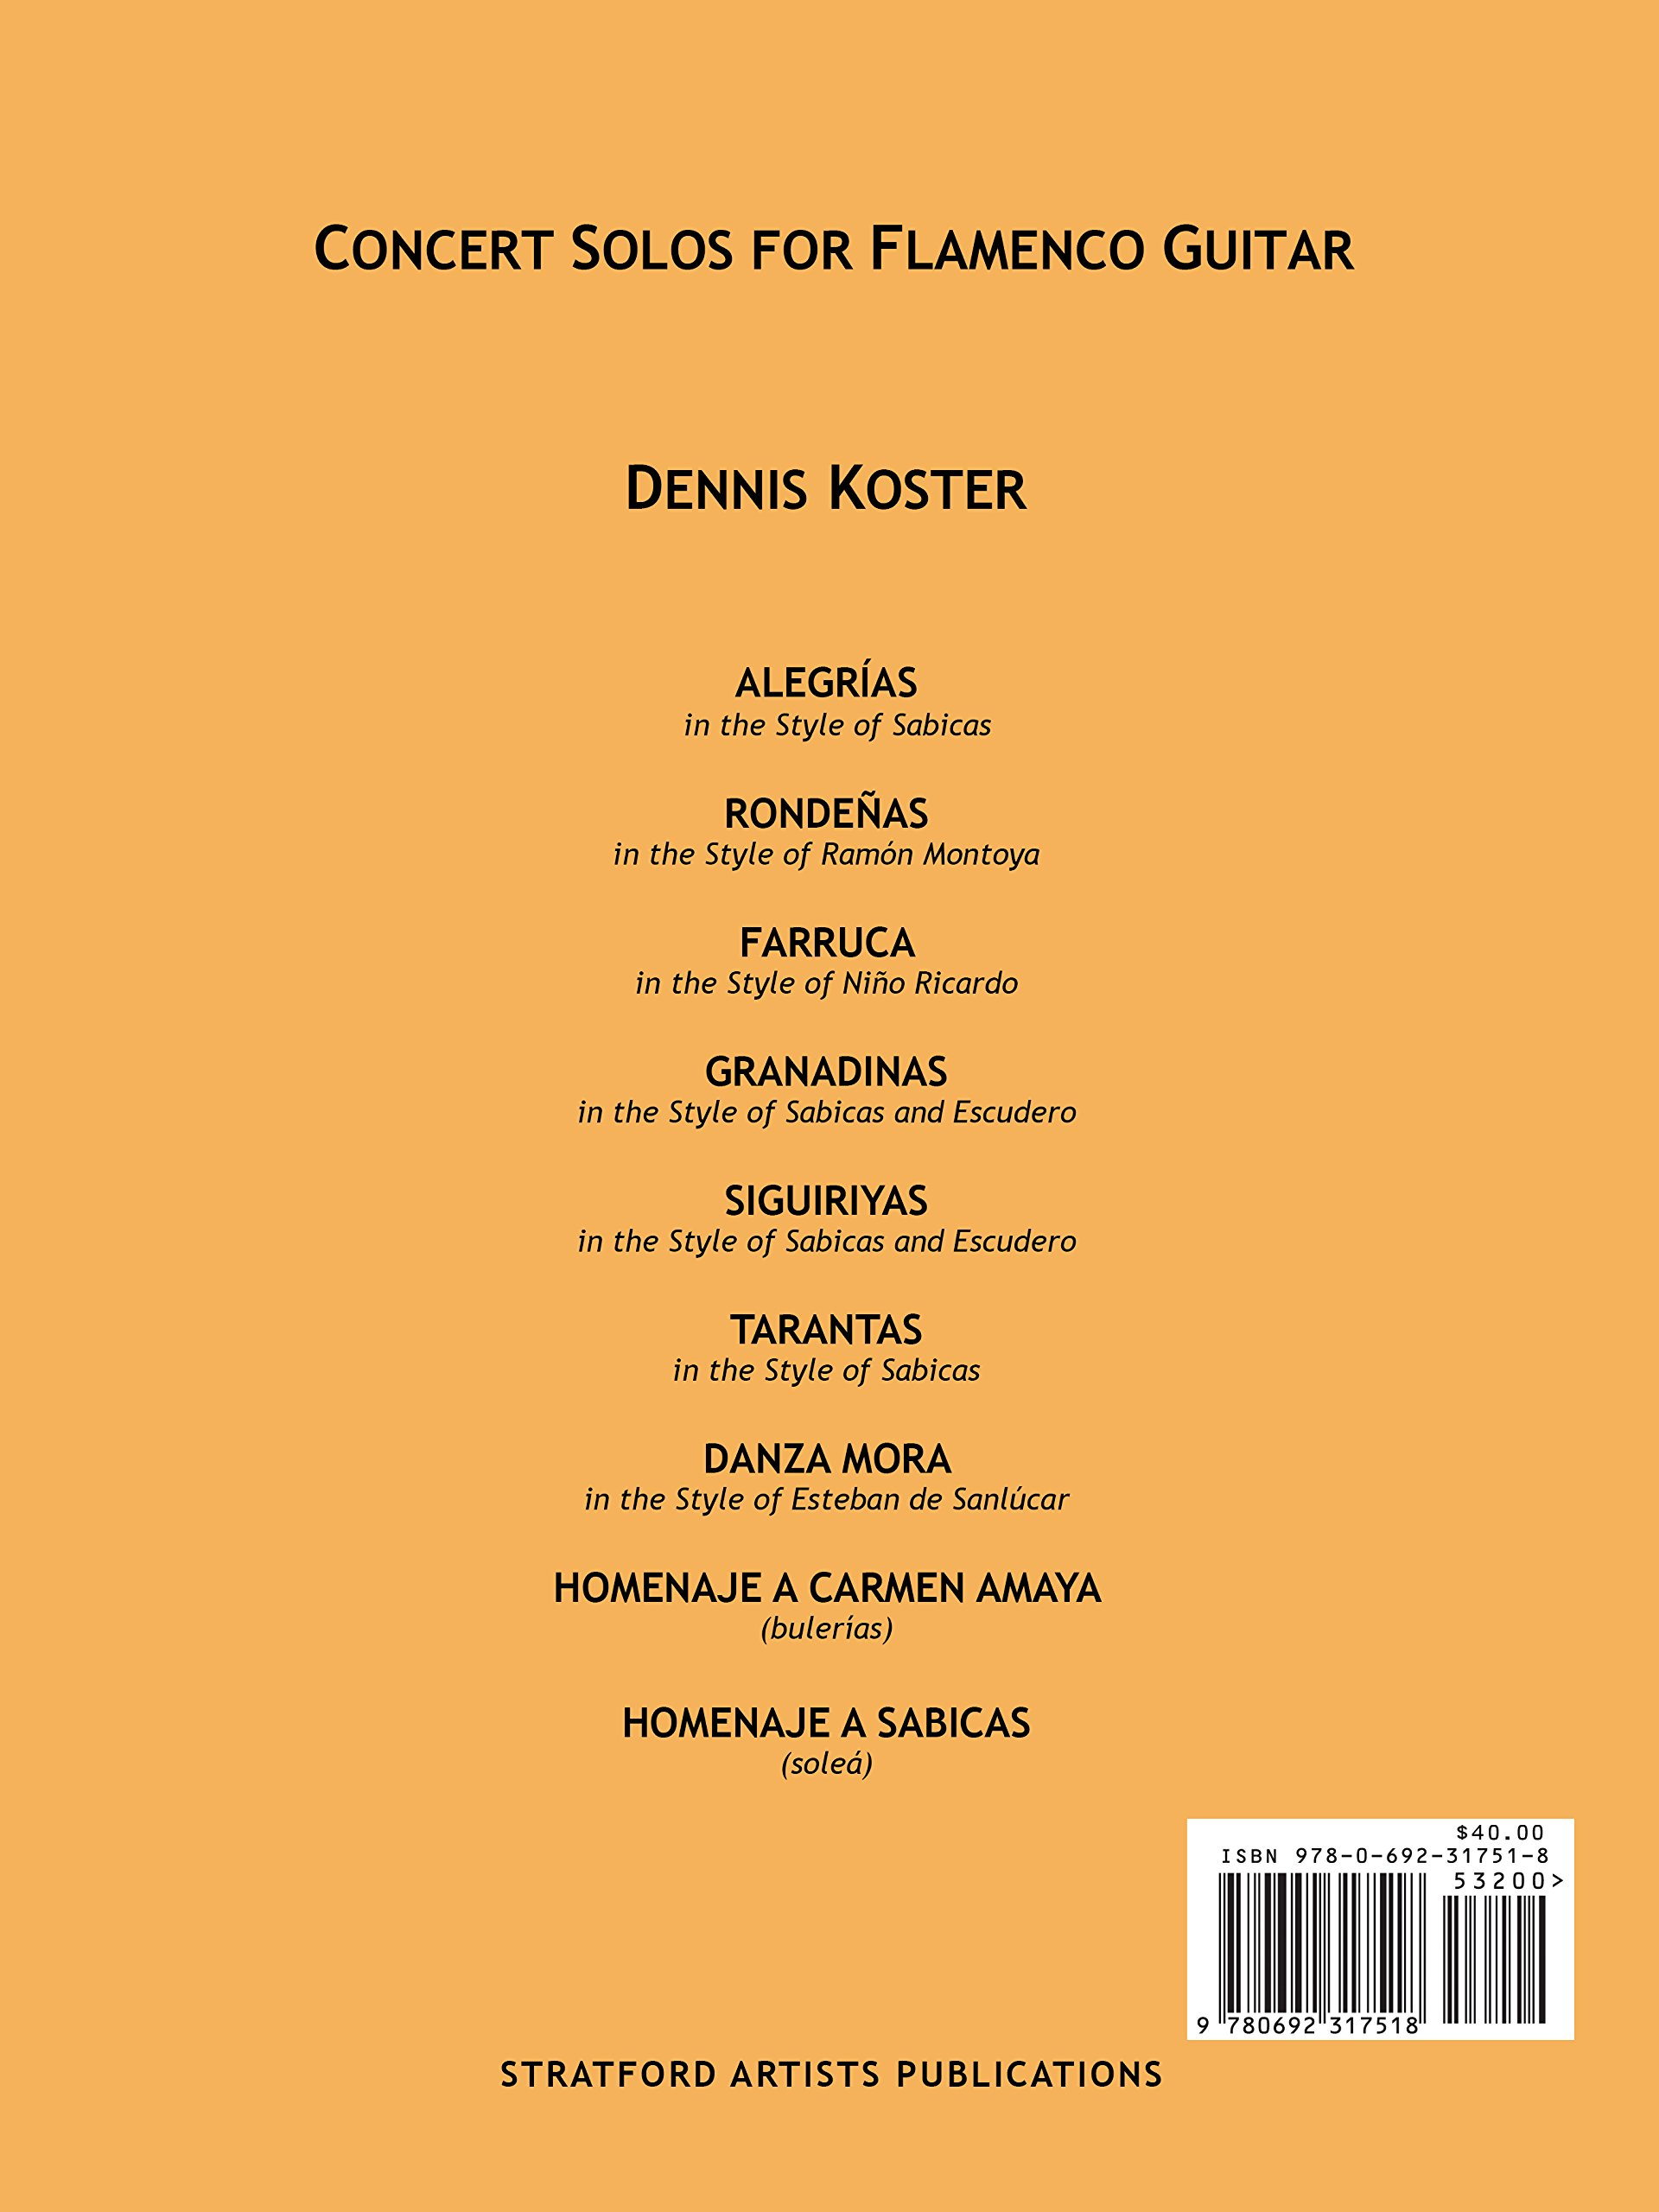 Amazon.com: The Keys to Flamenco Guitar, Part III: Concert ...